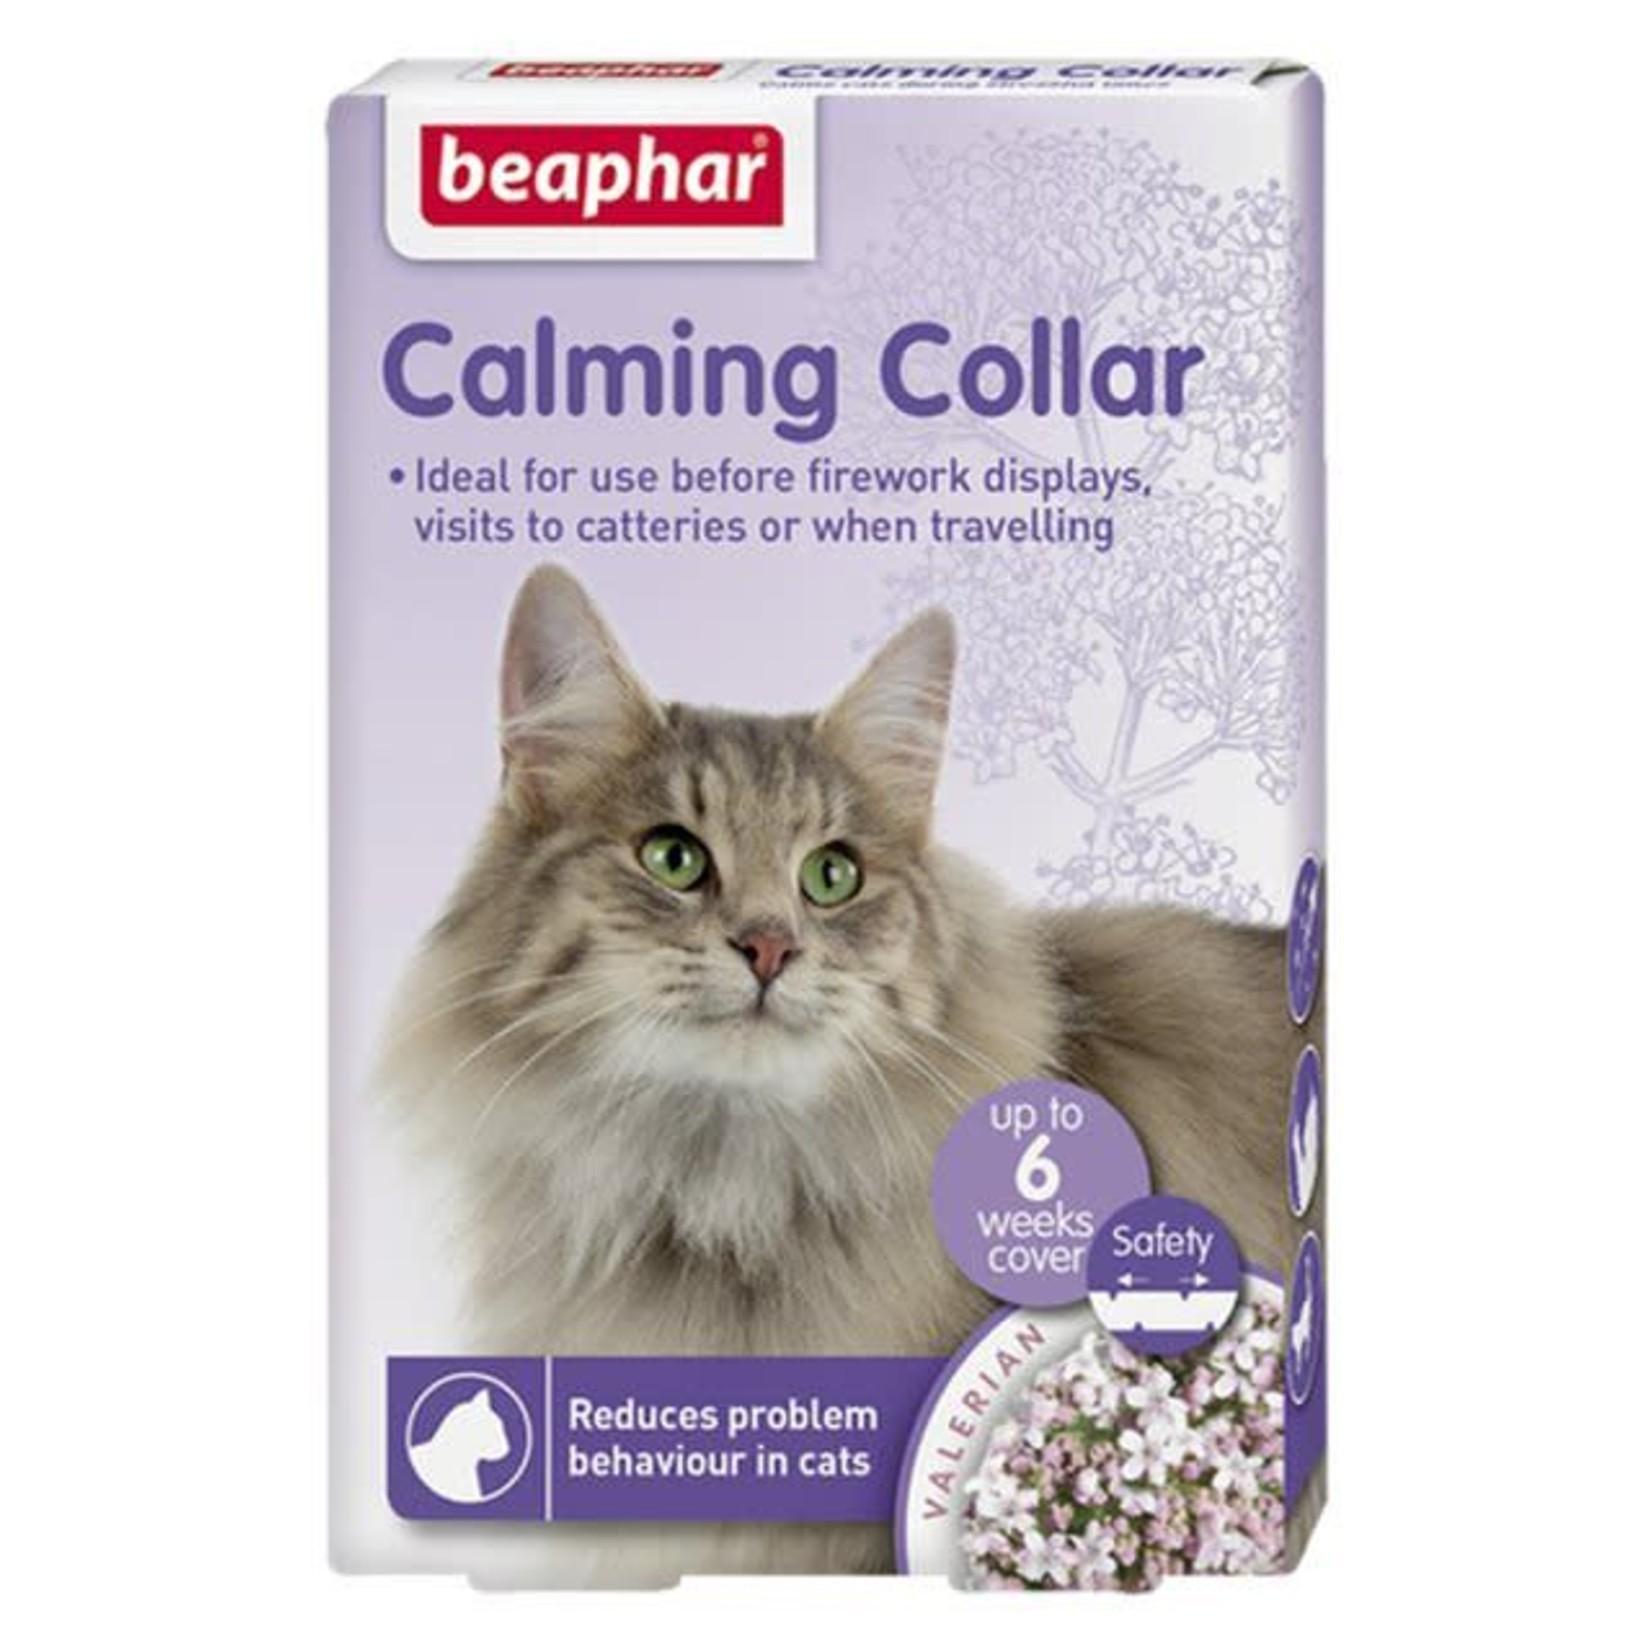 Beaphar Calming Collar for Cats, 35cm